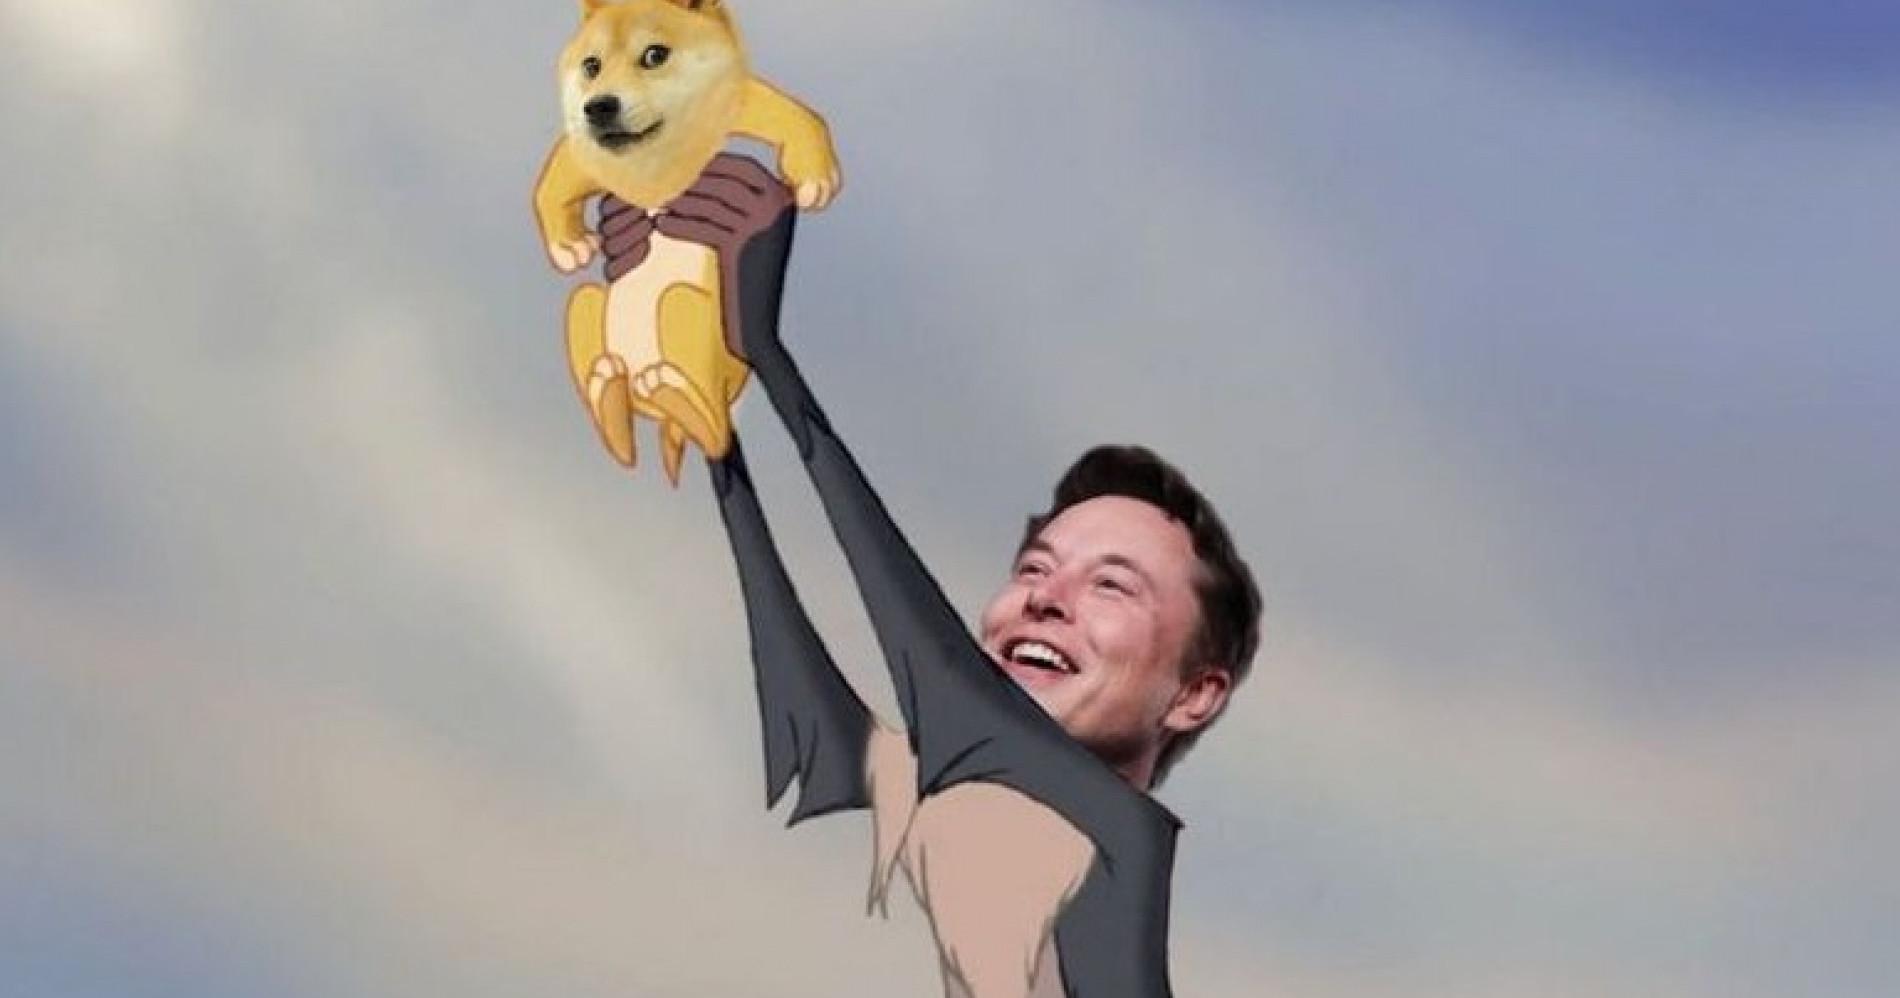 Meme Elon Musk dan Dogecoin. source: zonabanten.com